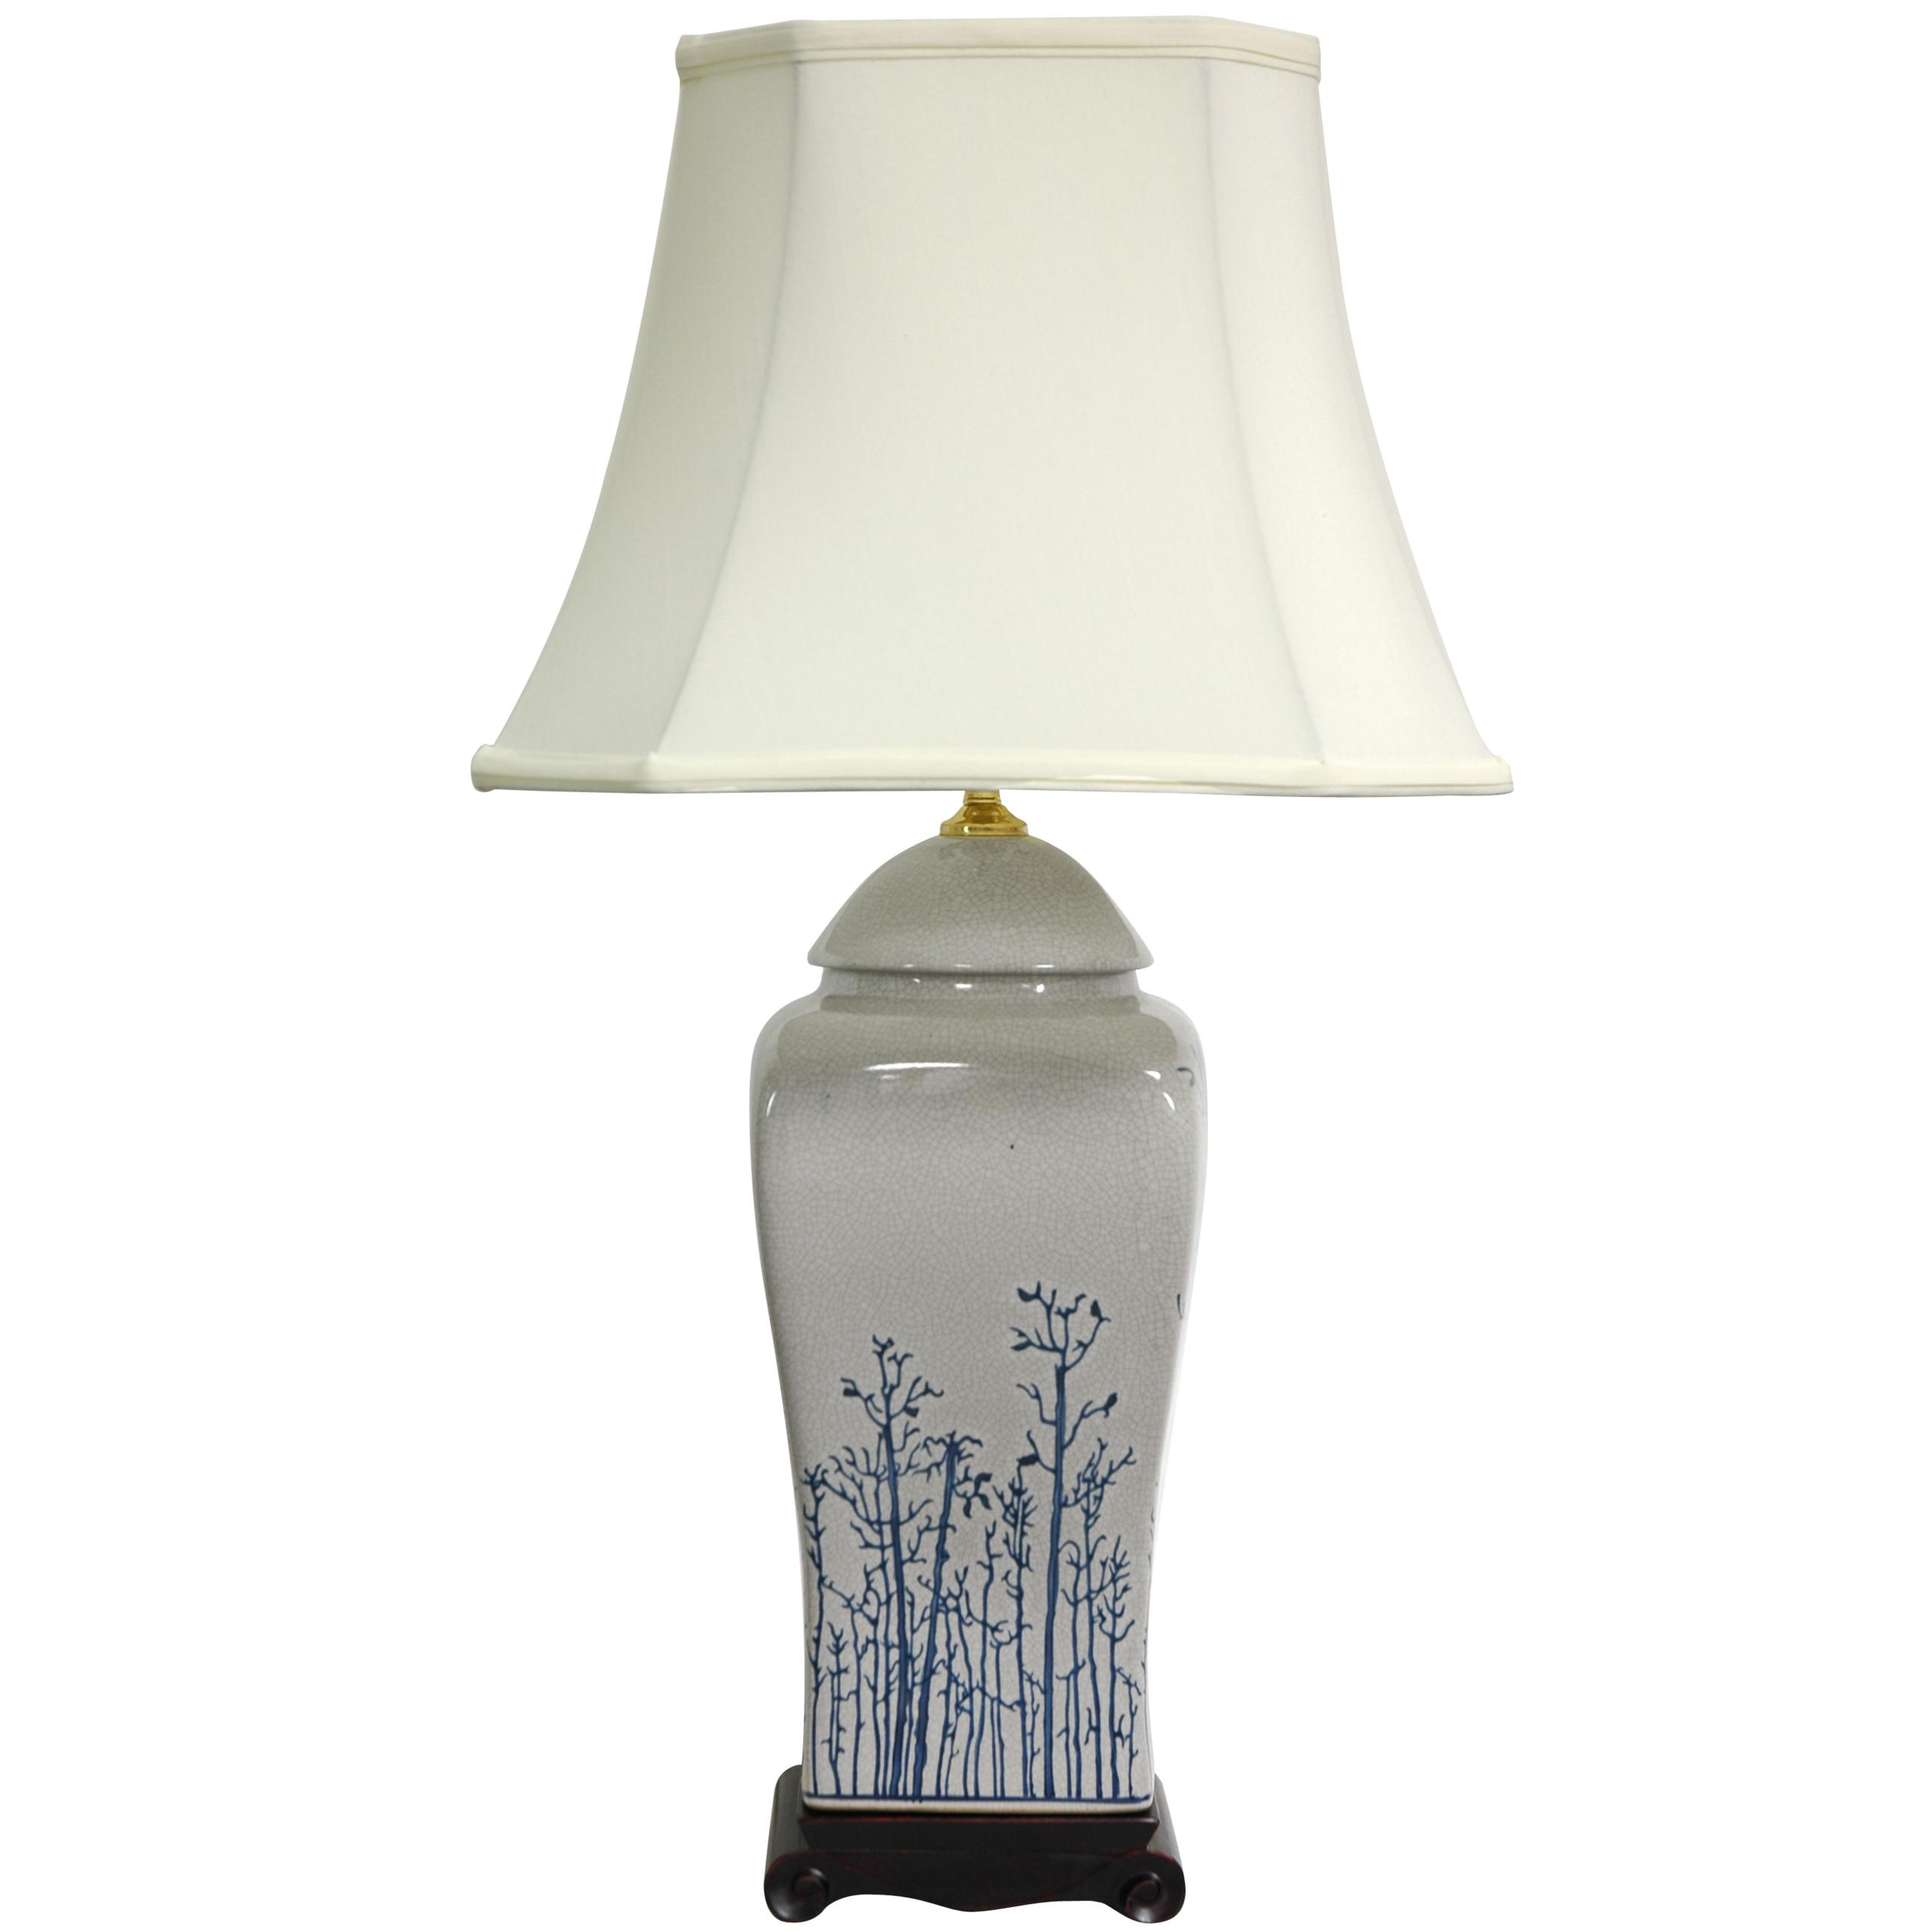 Oriental Furniture Fine Quality Inexpensive Deep Discounts Price Cuts,  26 Inch White Tree Oriental